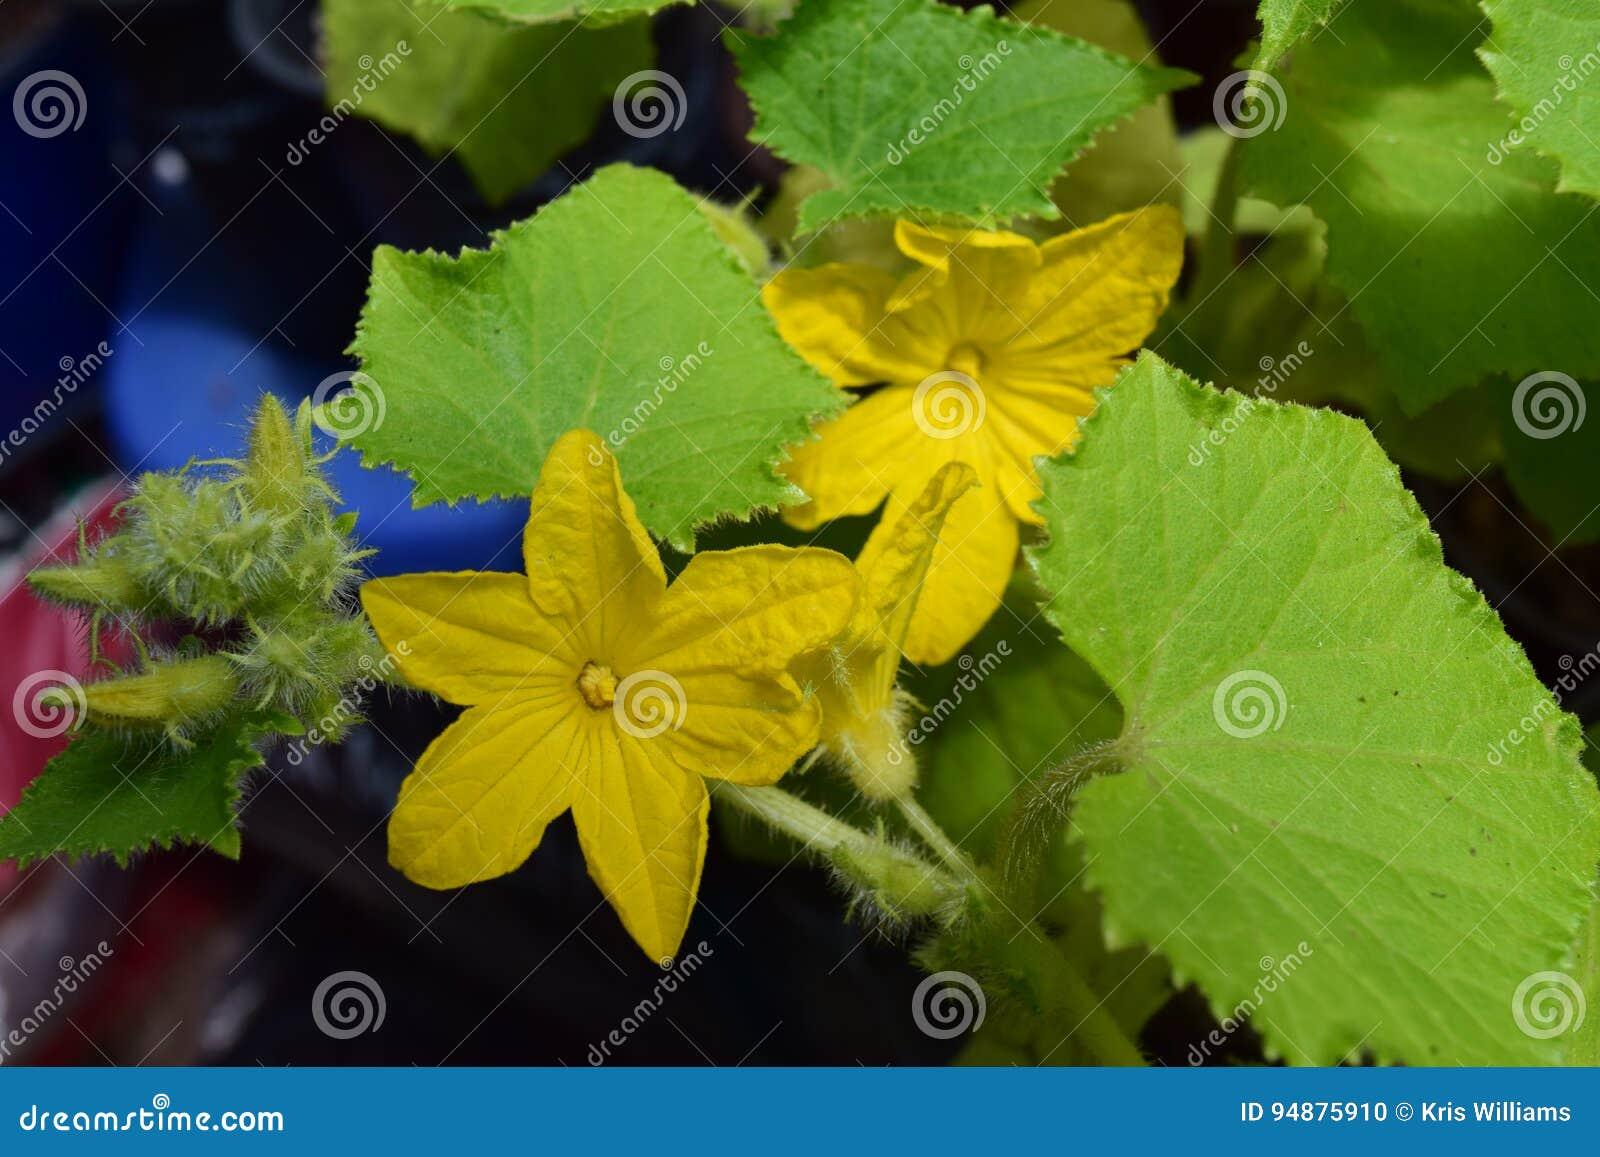 Delicate Yellow Flowering Cucumber Seedlings Stock Photo Image Of